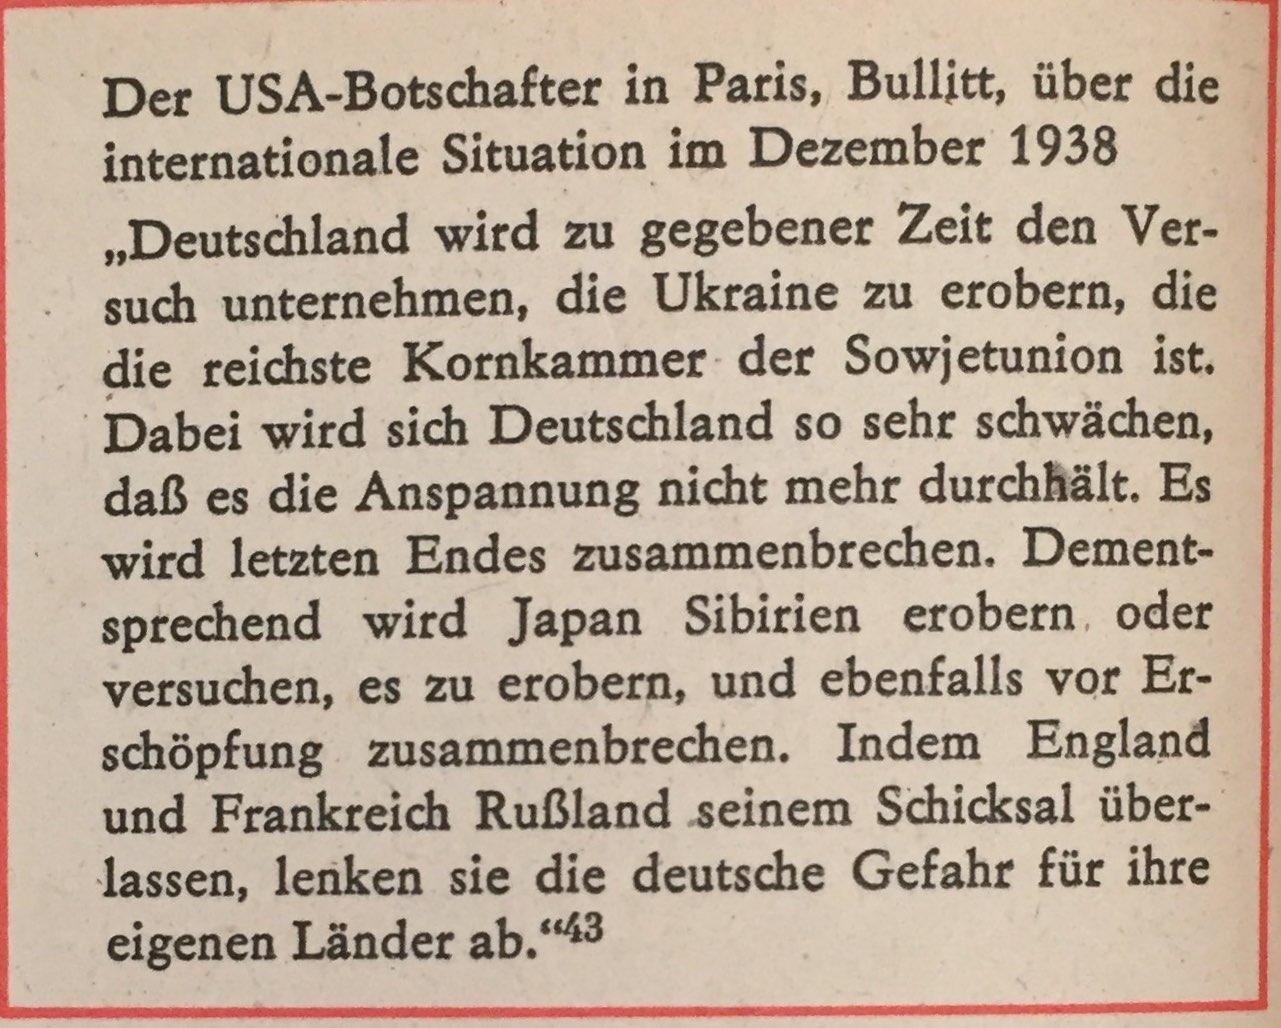 USA-Botschafter über internationale Situation Dezember 1938